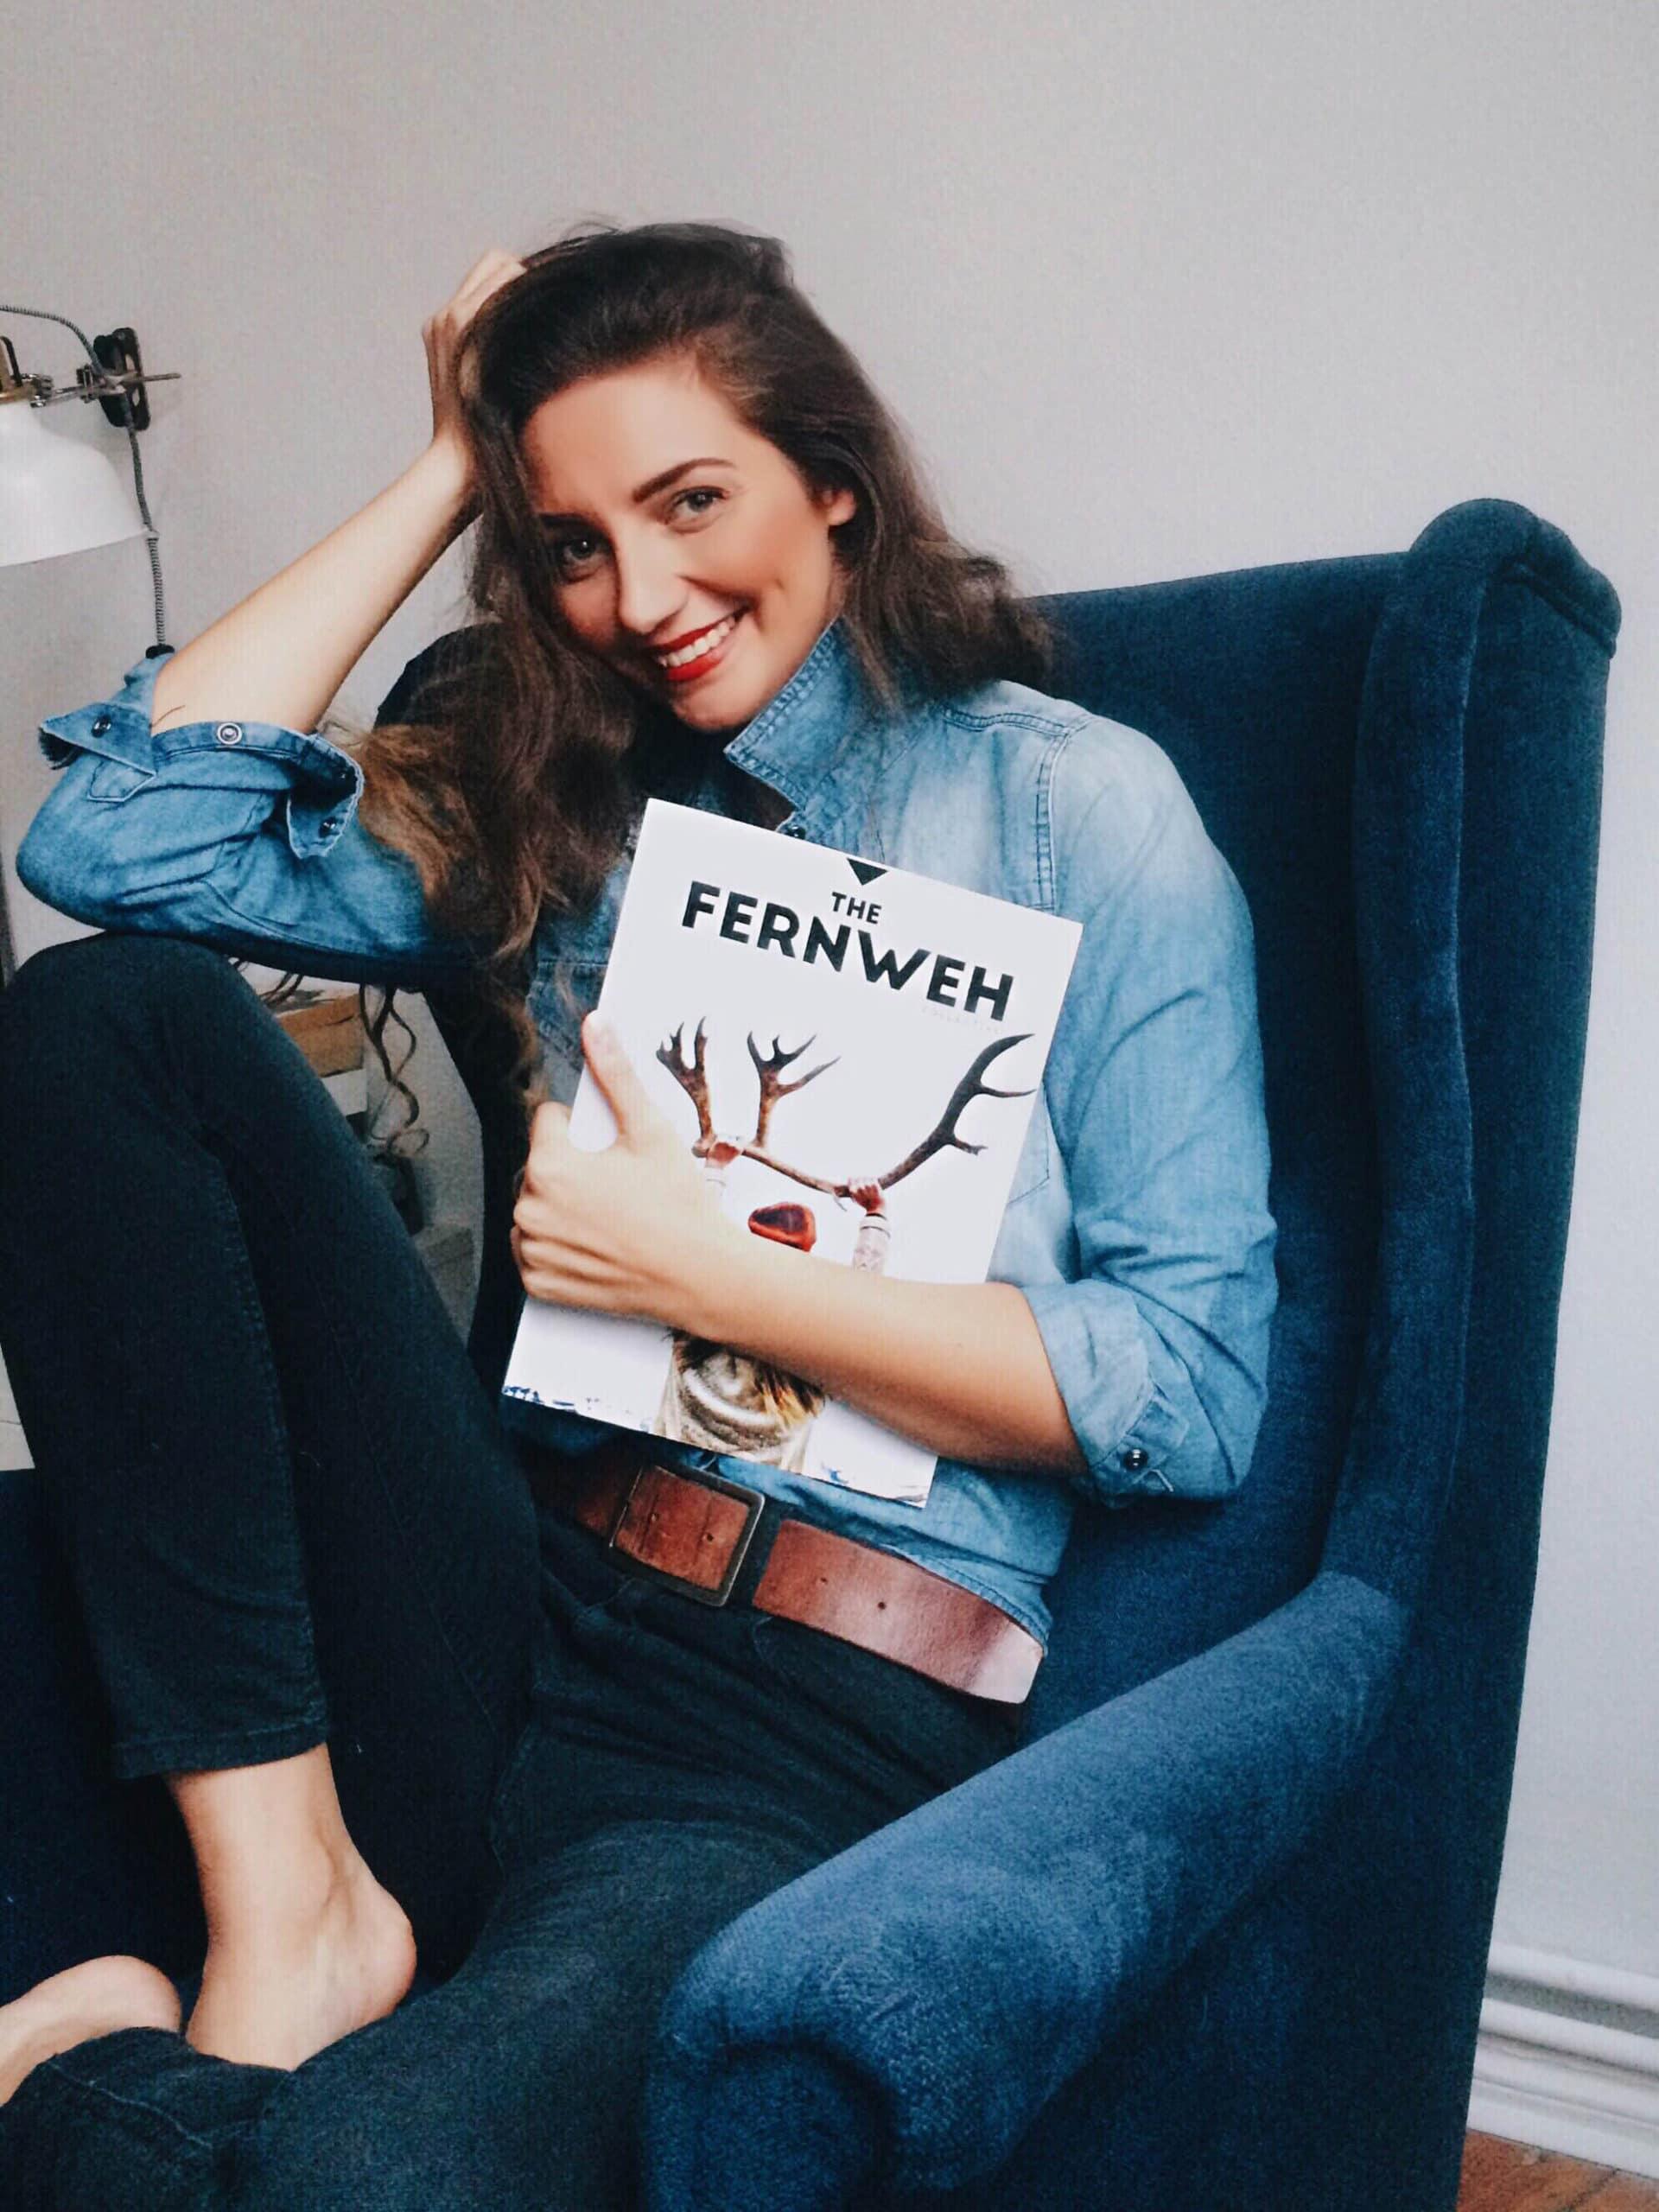 Elisaveta mit Magazin auf Sessel